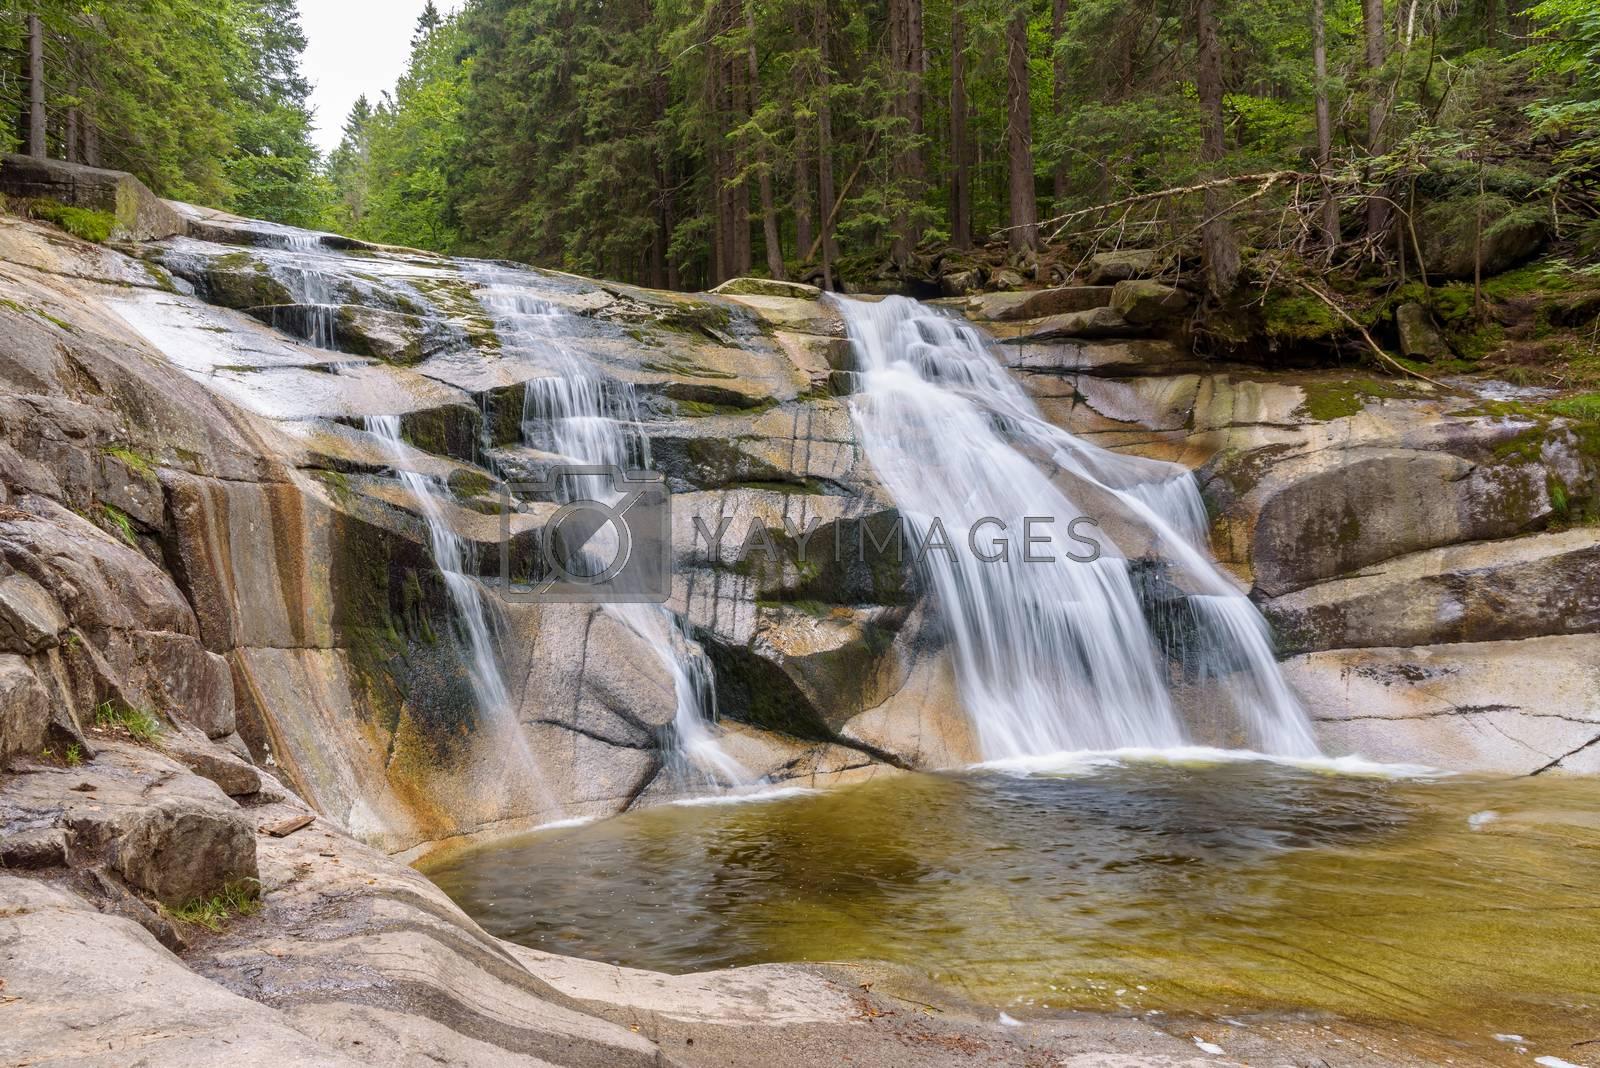 View of Mumlava Waterfall near Harrachov in Czech Giant Mountains